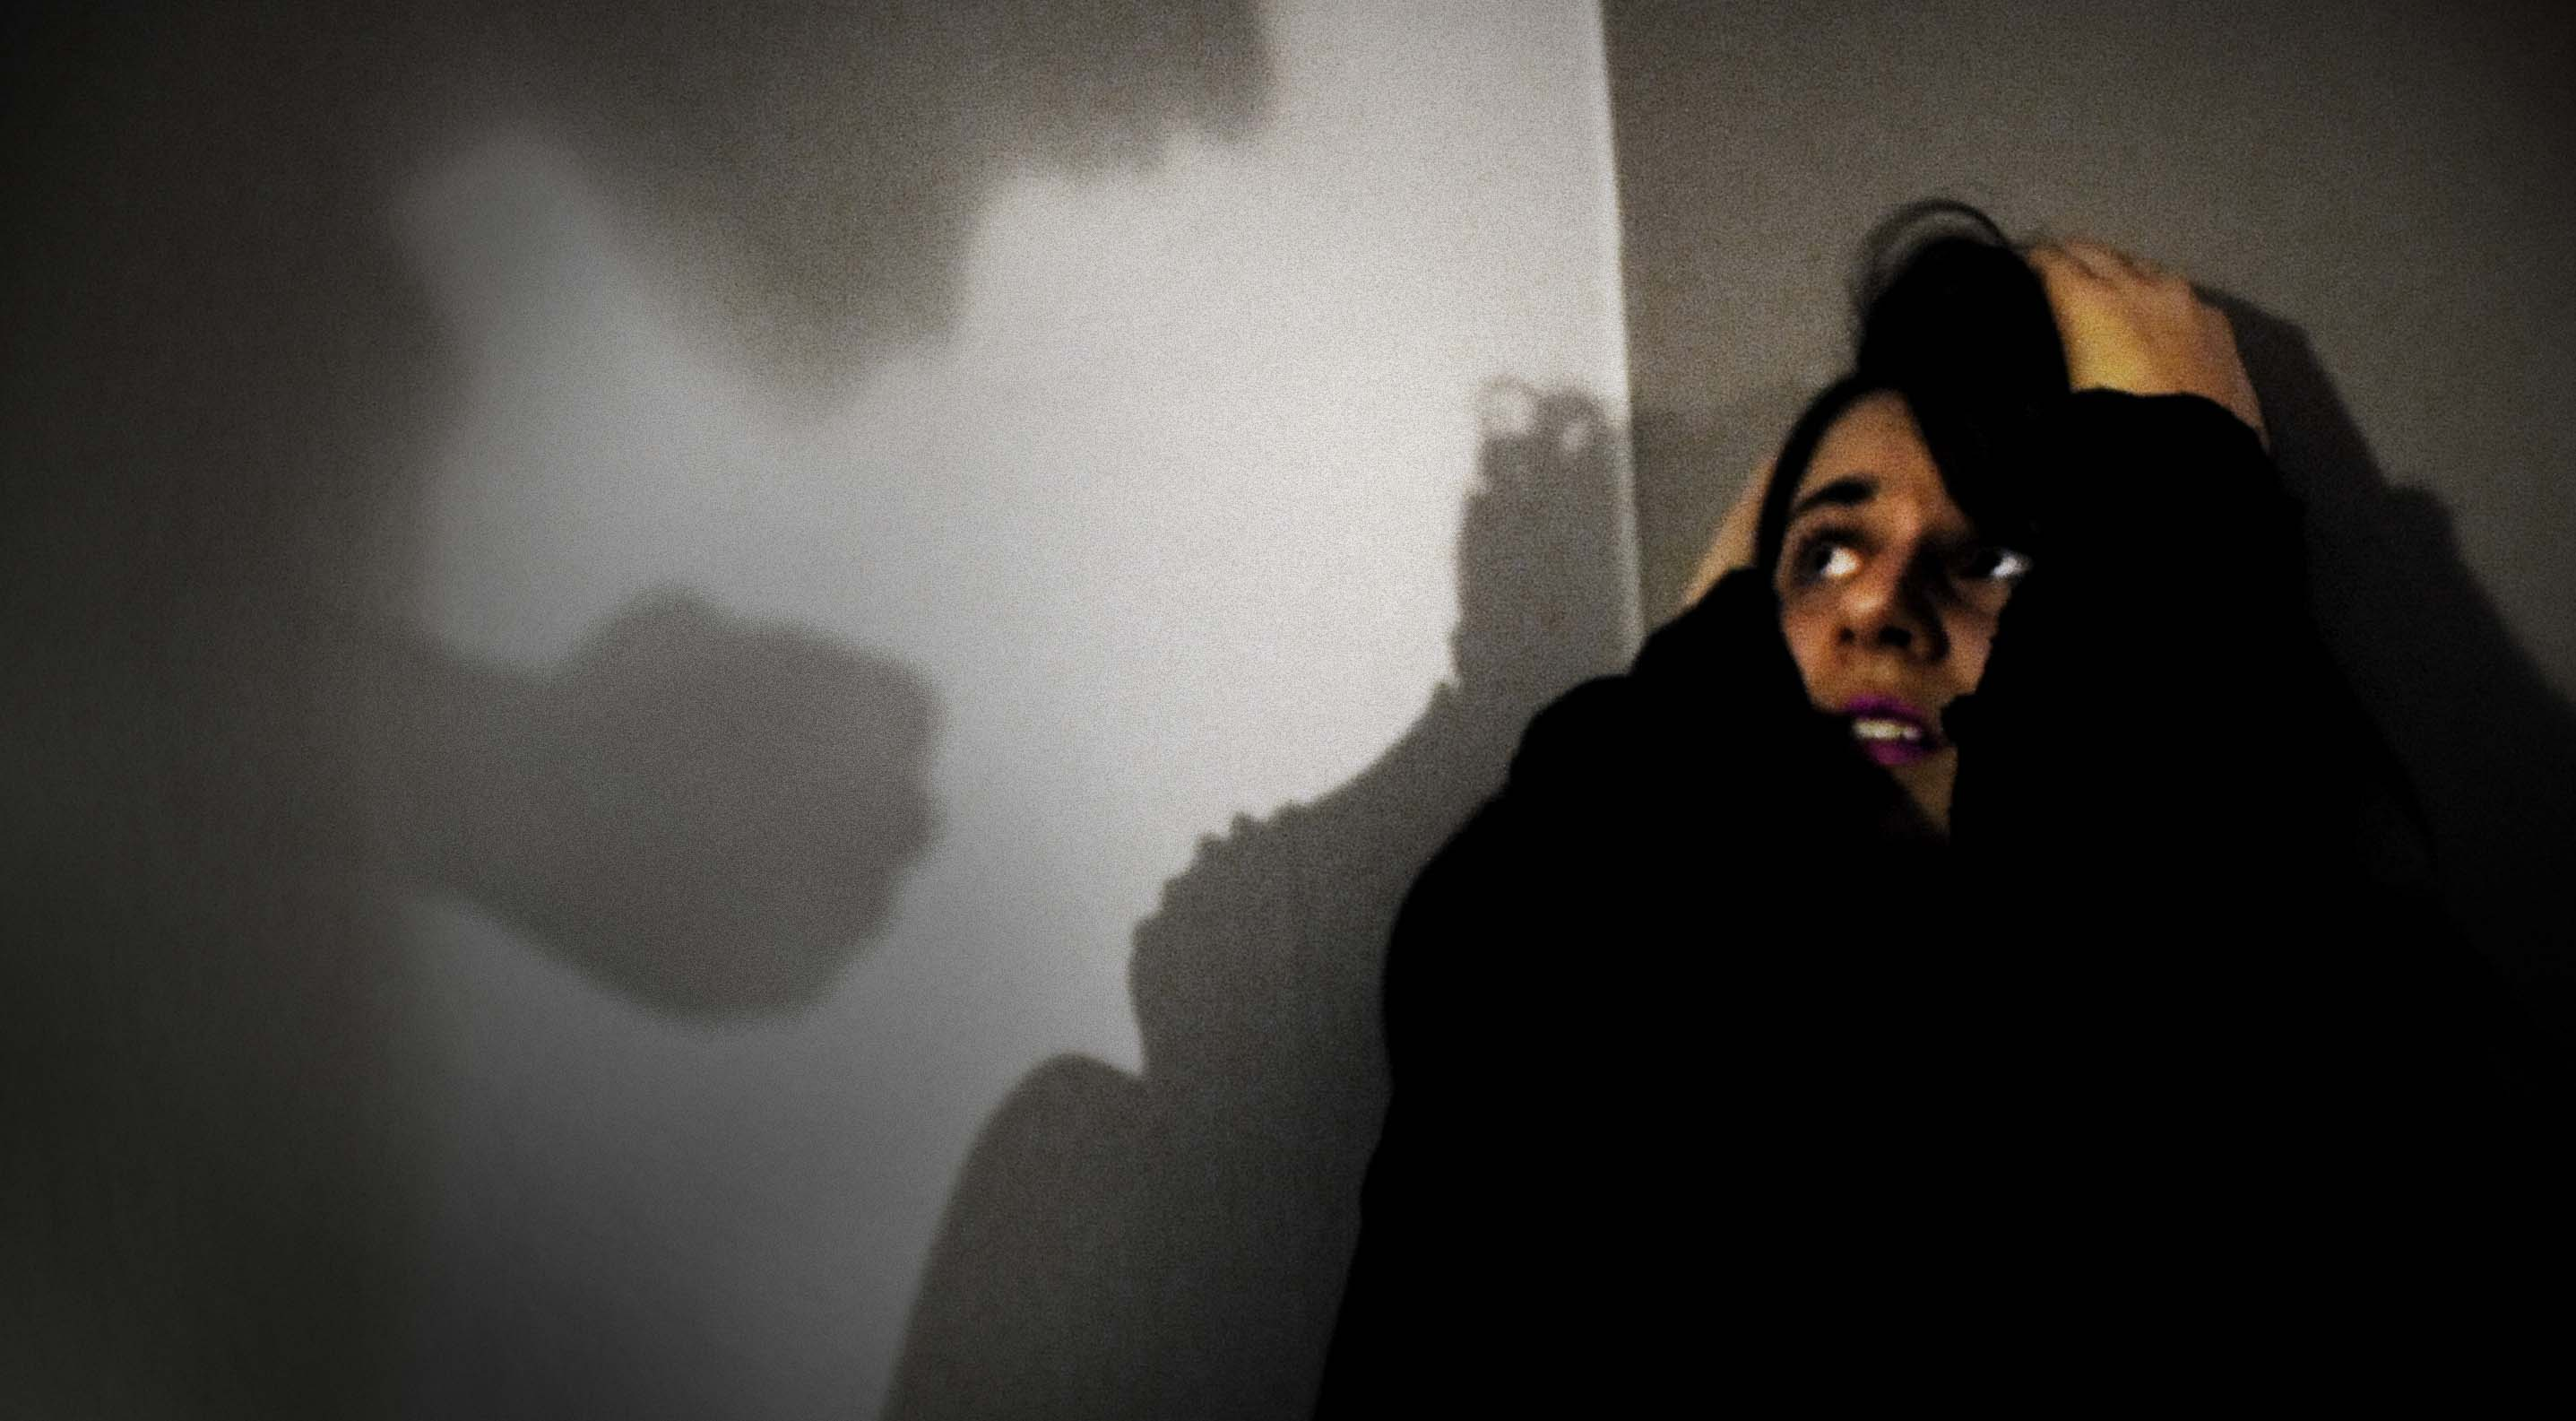 Vittime di violenze e femminicidio